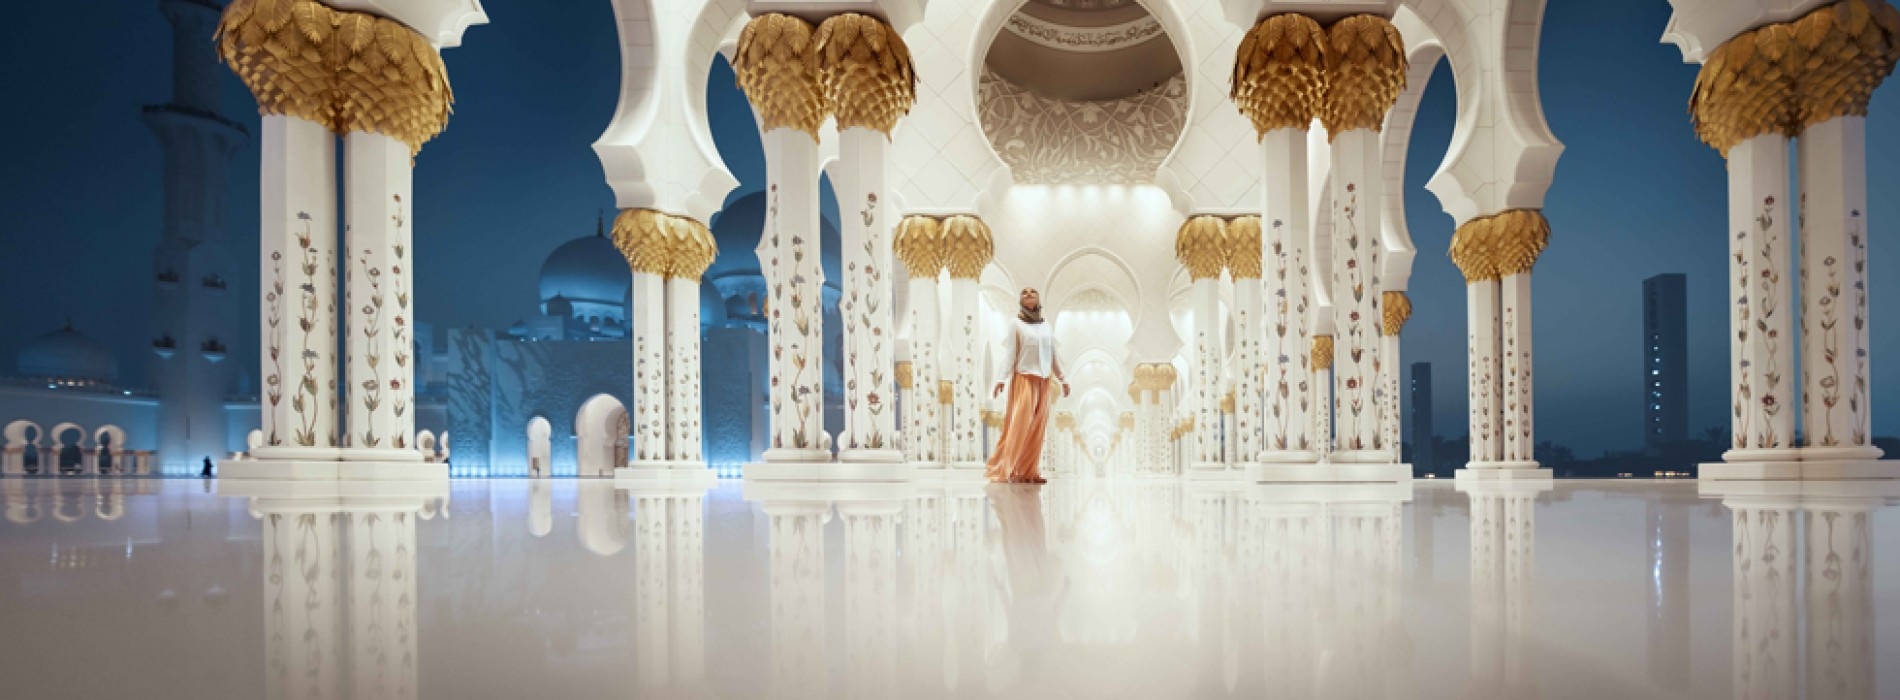 Louvre Abu Dhabi announces Contemporary Commissions